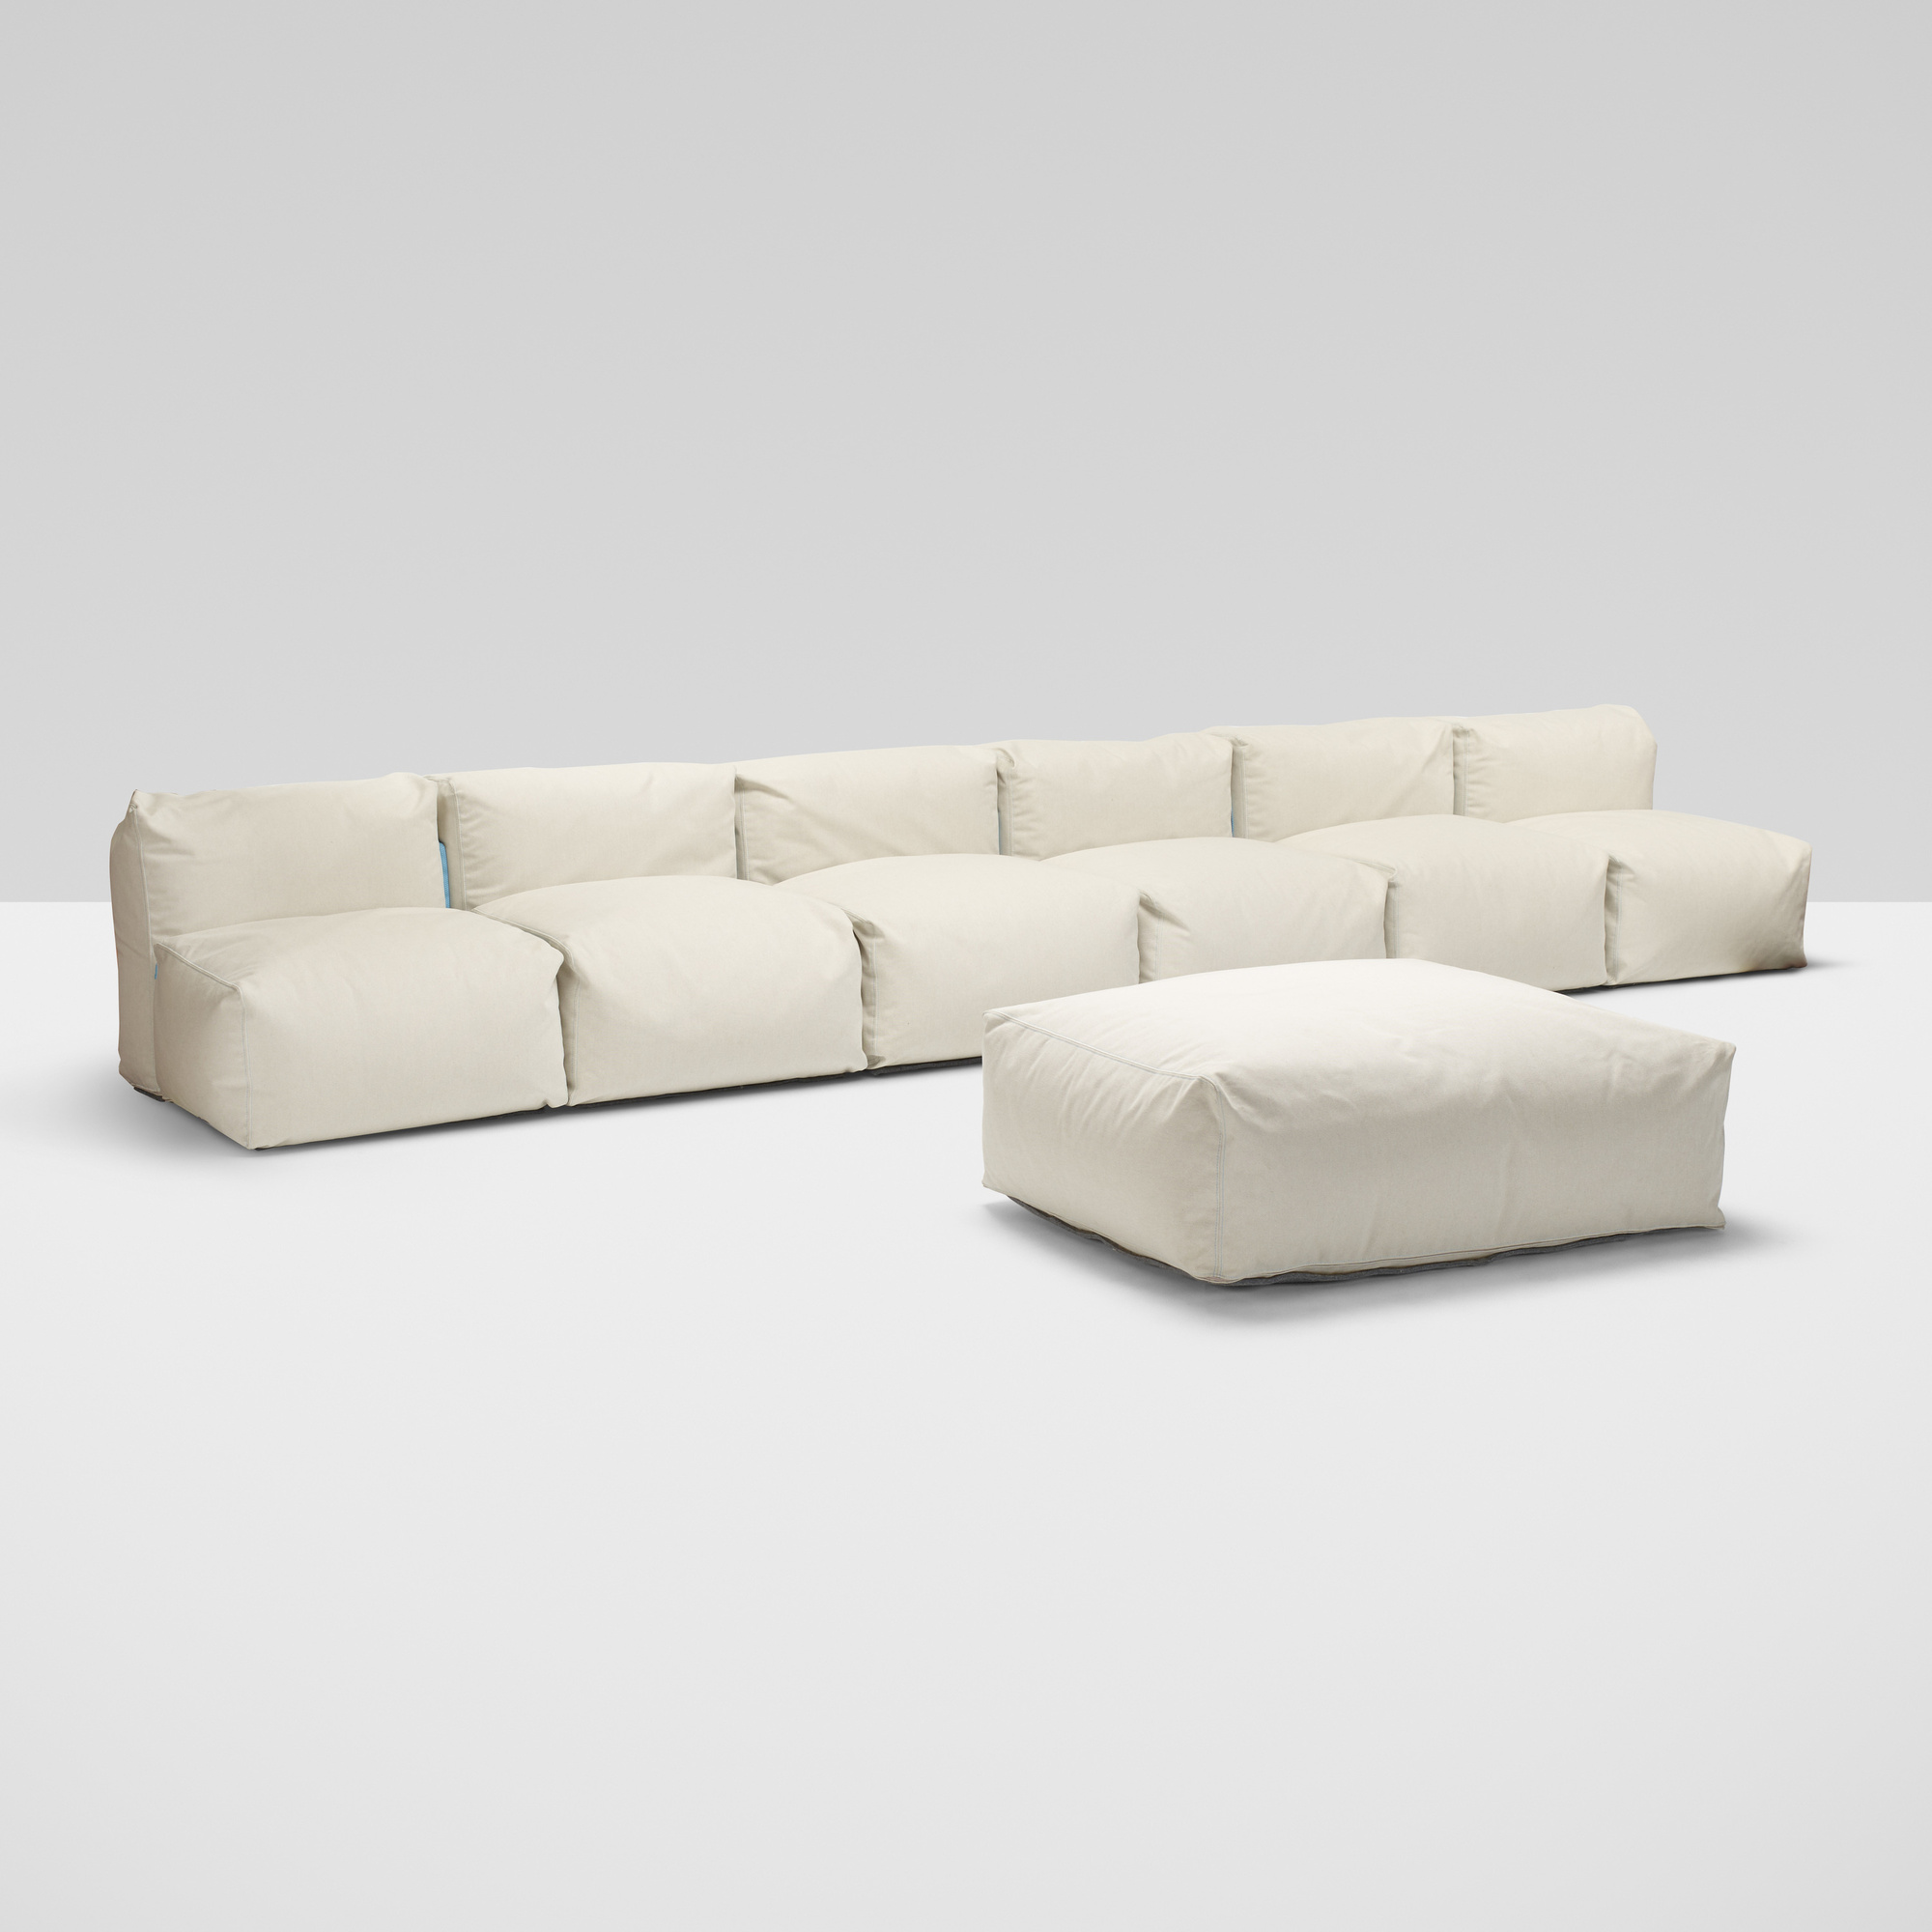 377 Jasper Morrison Superoblong Sofa 1 Of 3